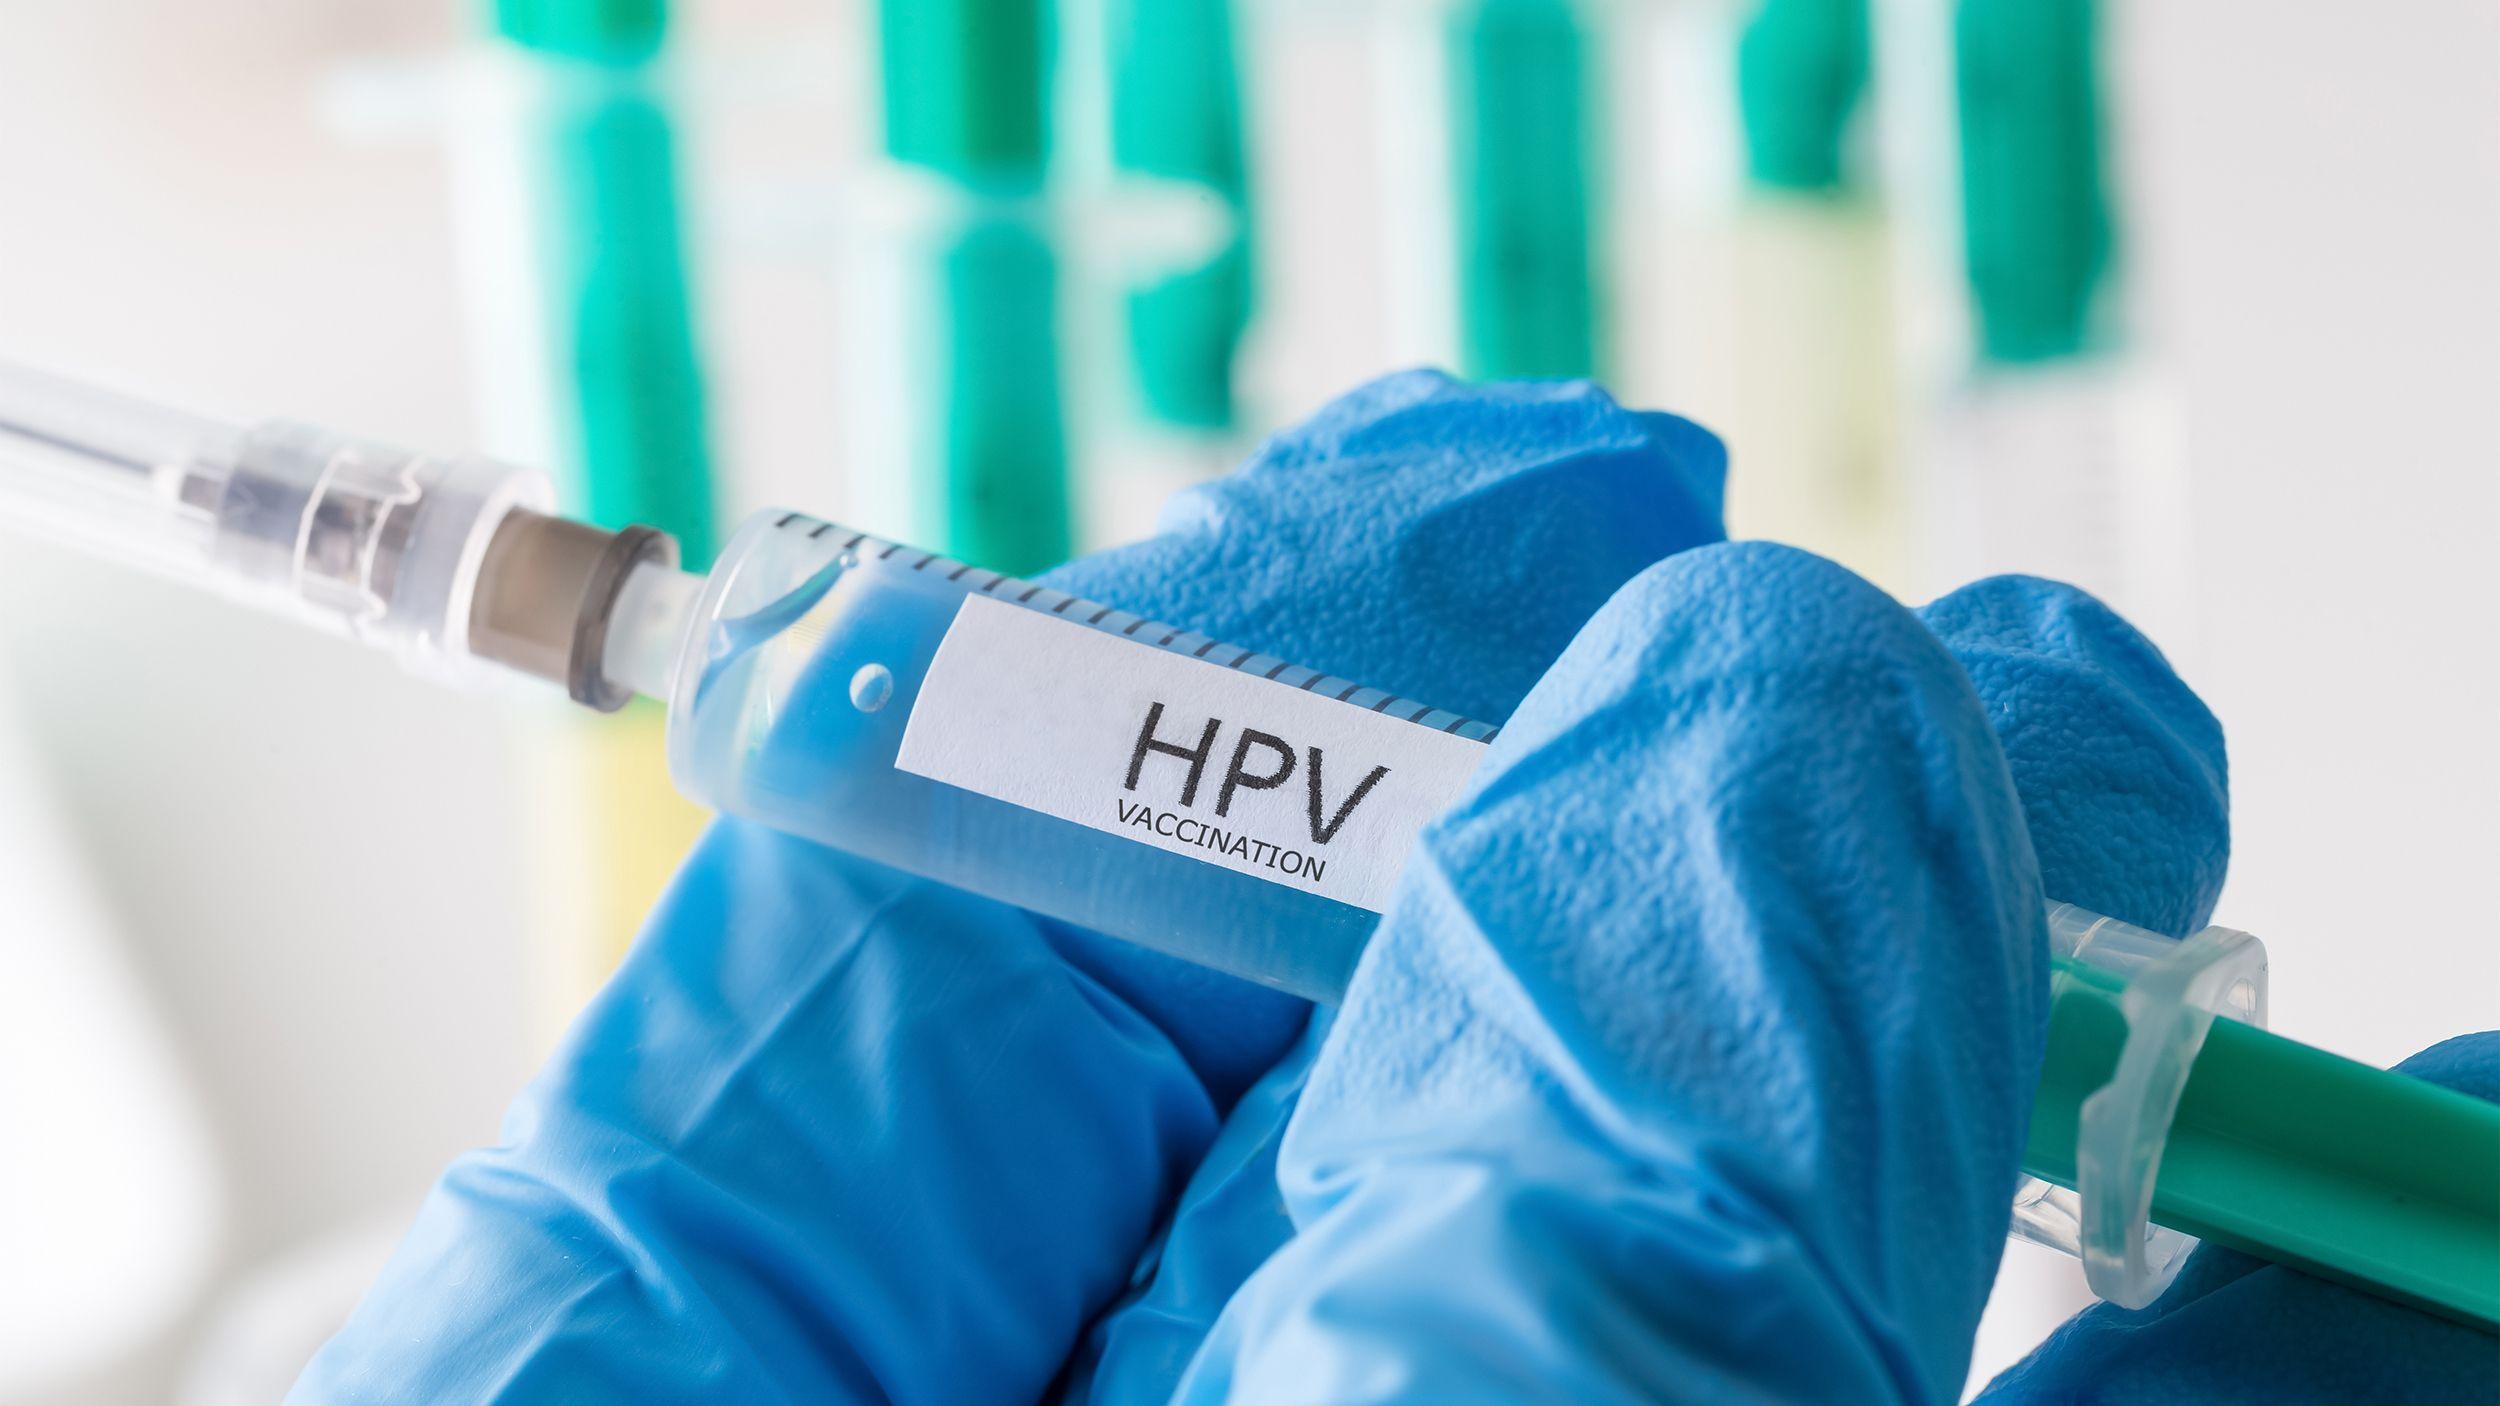 hpv impfung zentrum der gesundheit giardia parazita az emberek kezelésében